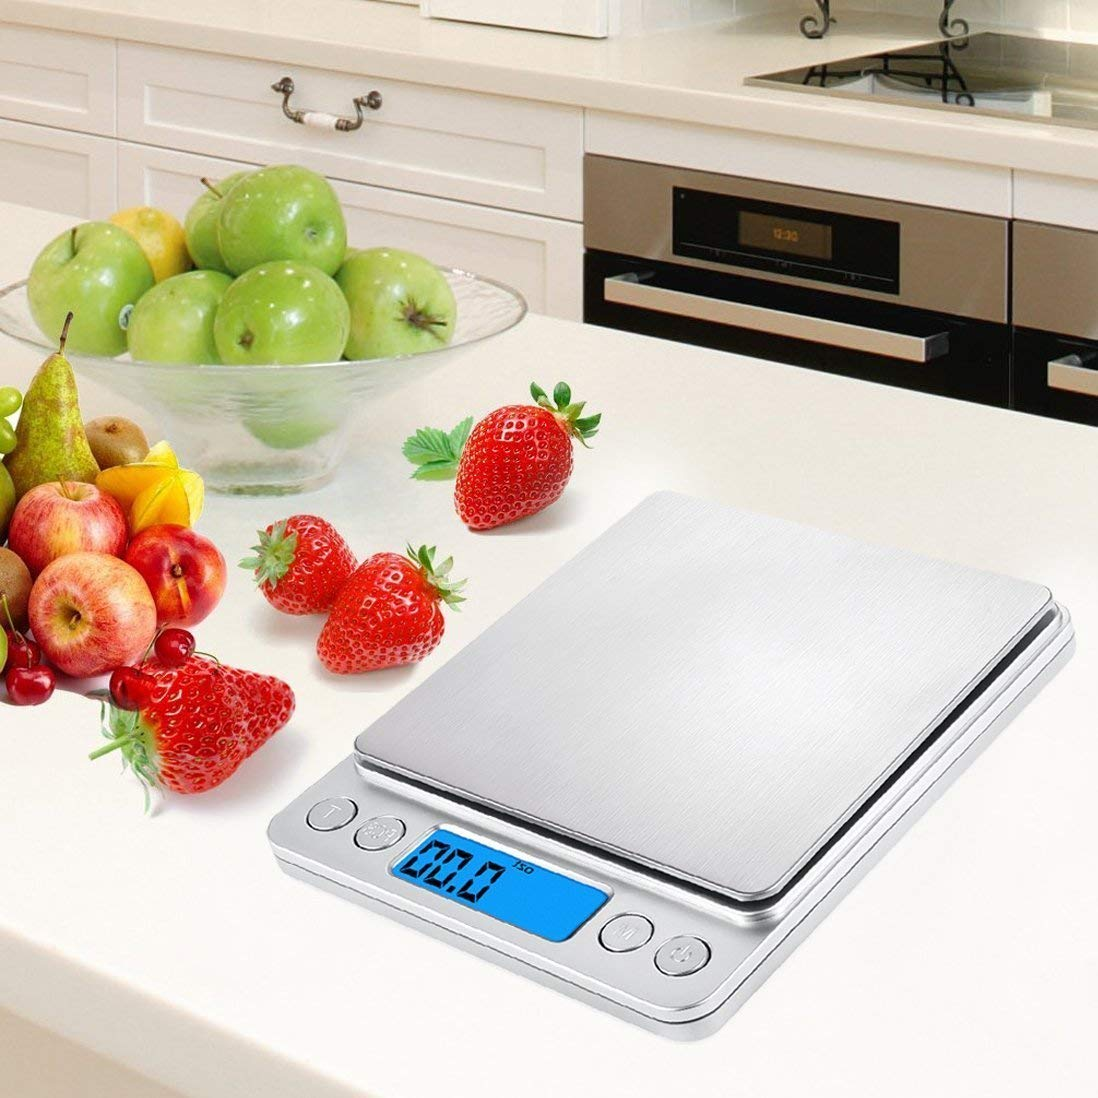 Eidyer Báscula Digital para Cocina, 3kg-0.1g, Batería incluida, 2 bandejas, de retroiluminación LED, para Ingredientes, joyería, café, Medicina, ...